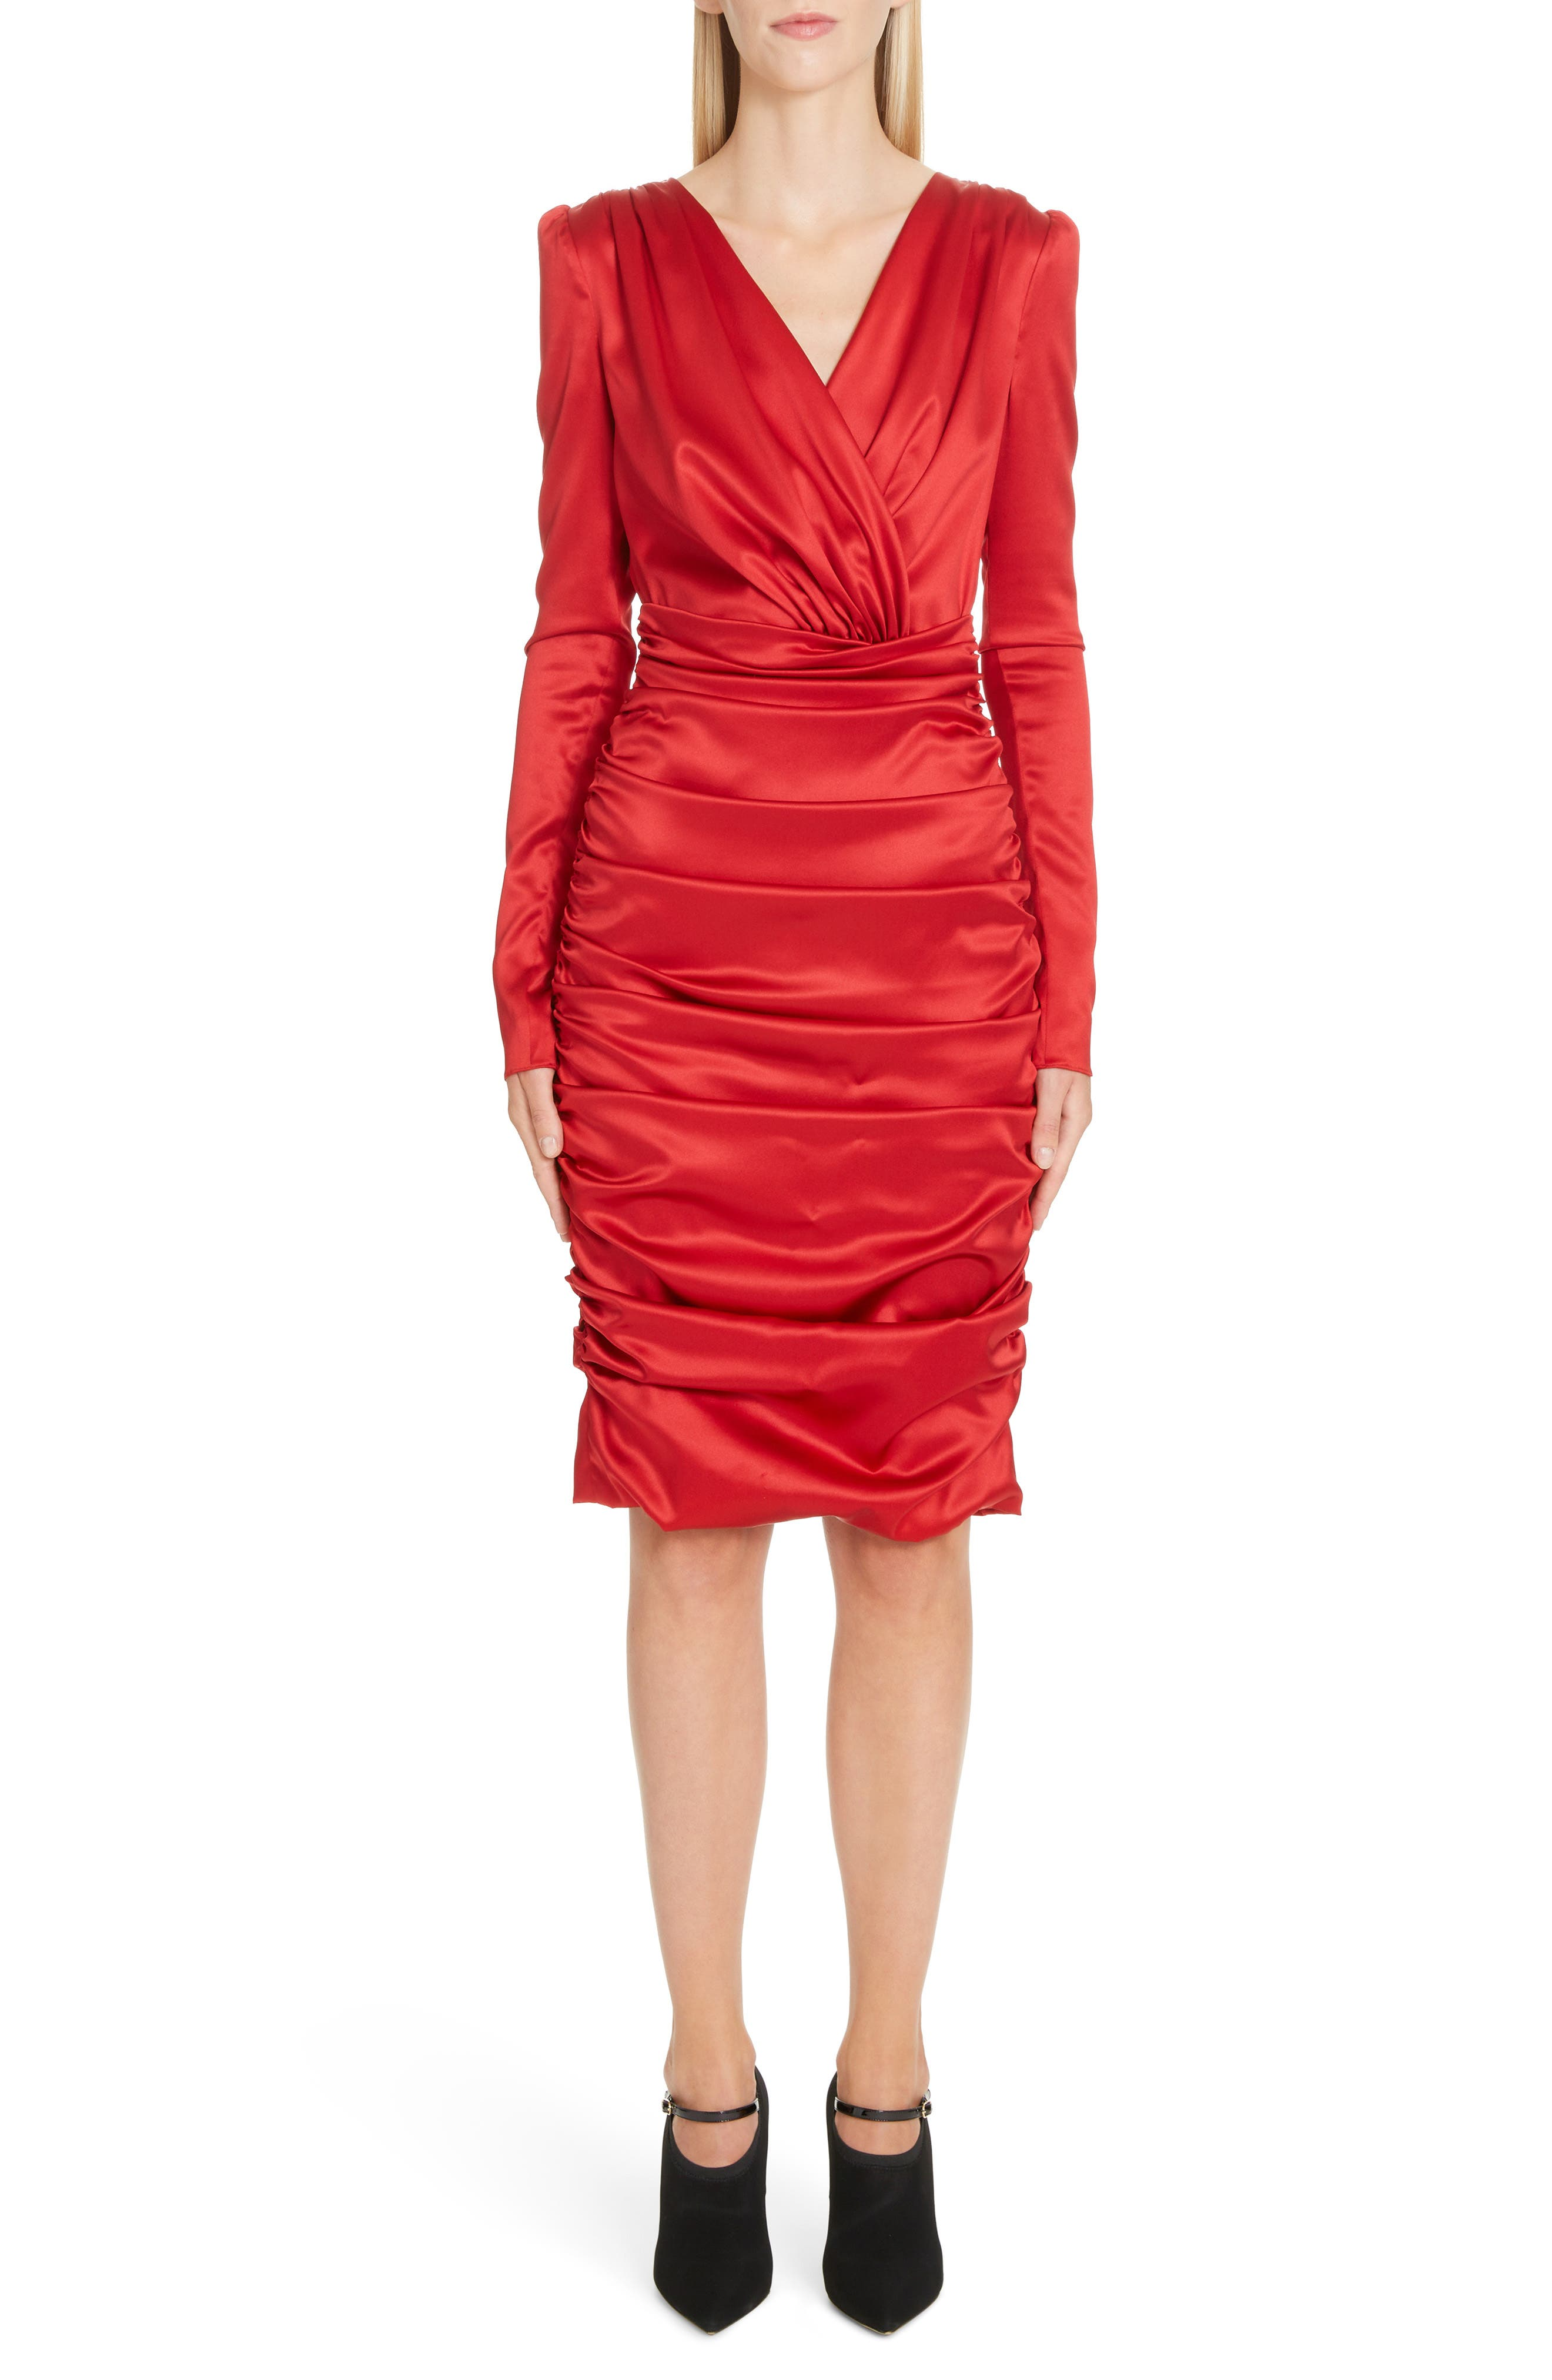 Dolce & gabbana Stretch Silk Satin Sheath Dress, US / 44 IT - Red